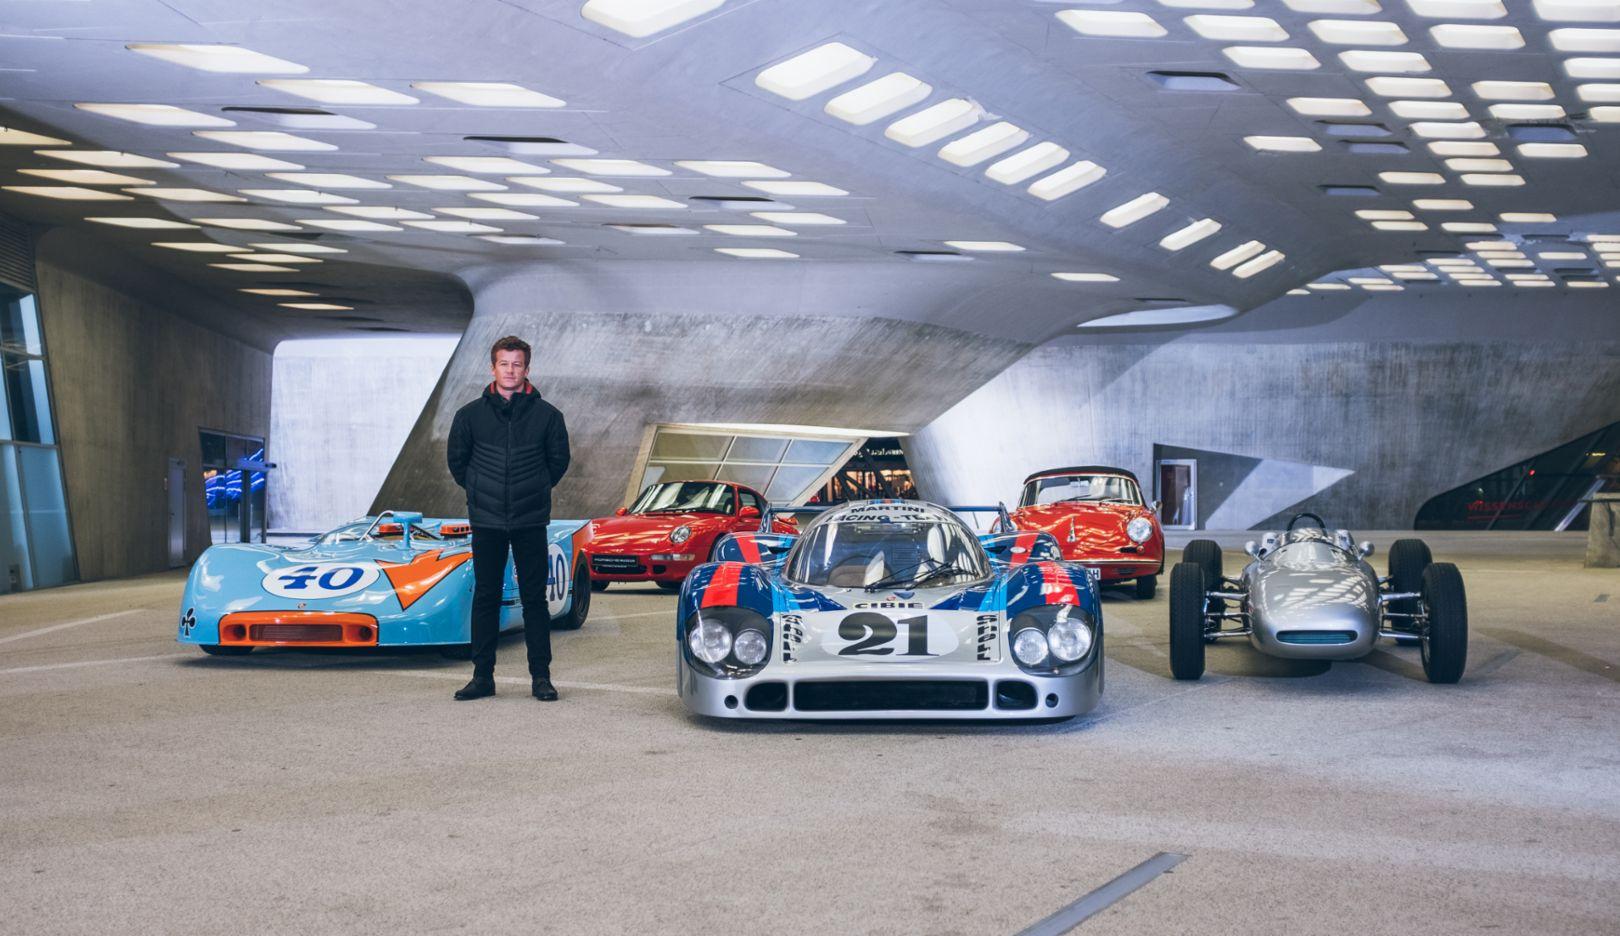 Patrick Long, works driver, 908/3 Spyder, 993 Turbo S 3.6., 917 LH (long tail), 356 B GS Carrera GT, 804 Formula 1 race car, 2018, Porsche AG